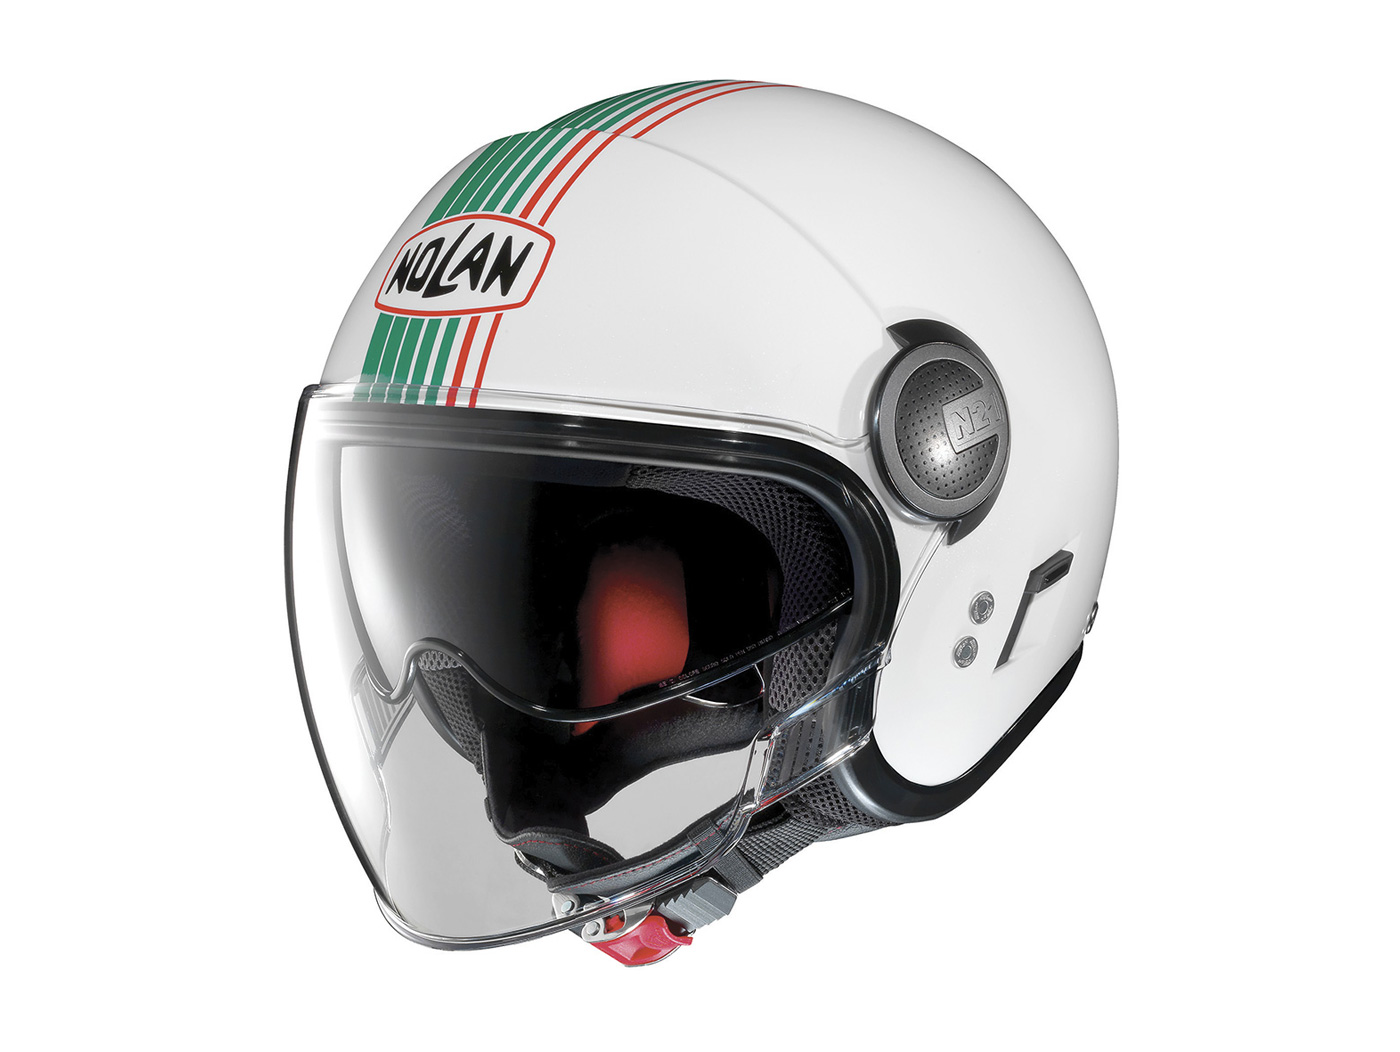 73b606b6 Helmet -NOLAN, N21 Visor Joie de Vivre- open face helmet, metallic white -  green -   Helmets   Riders gear   Scooter Center